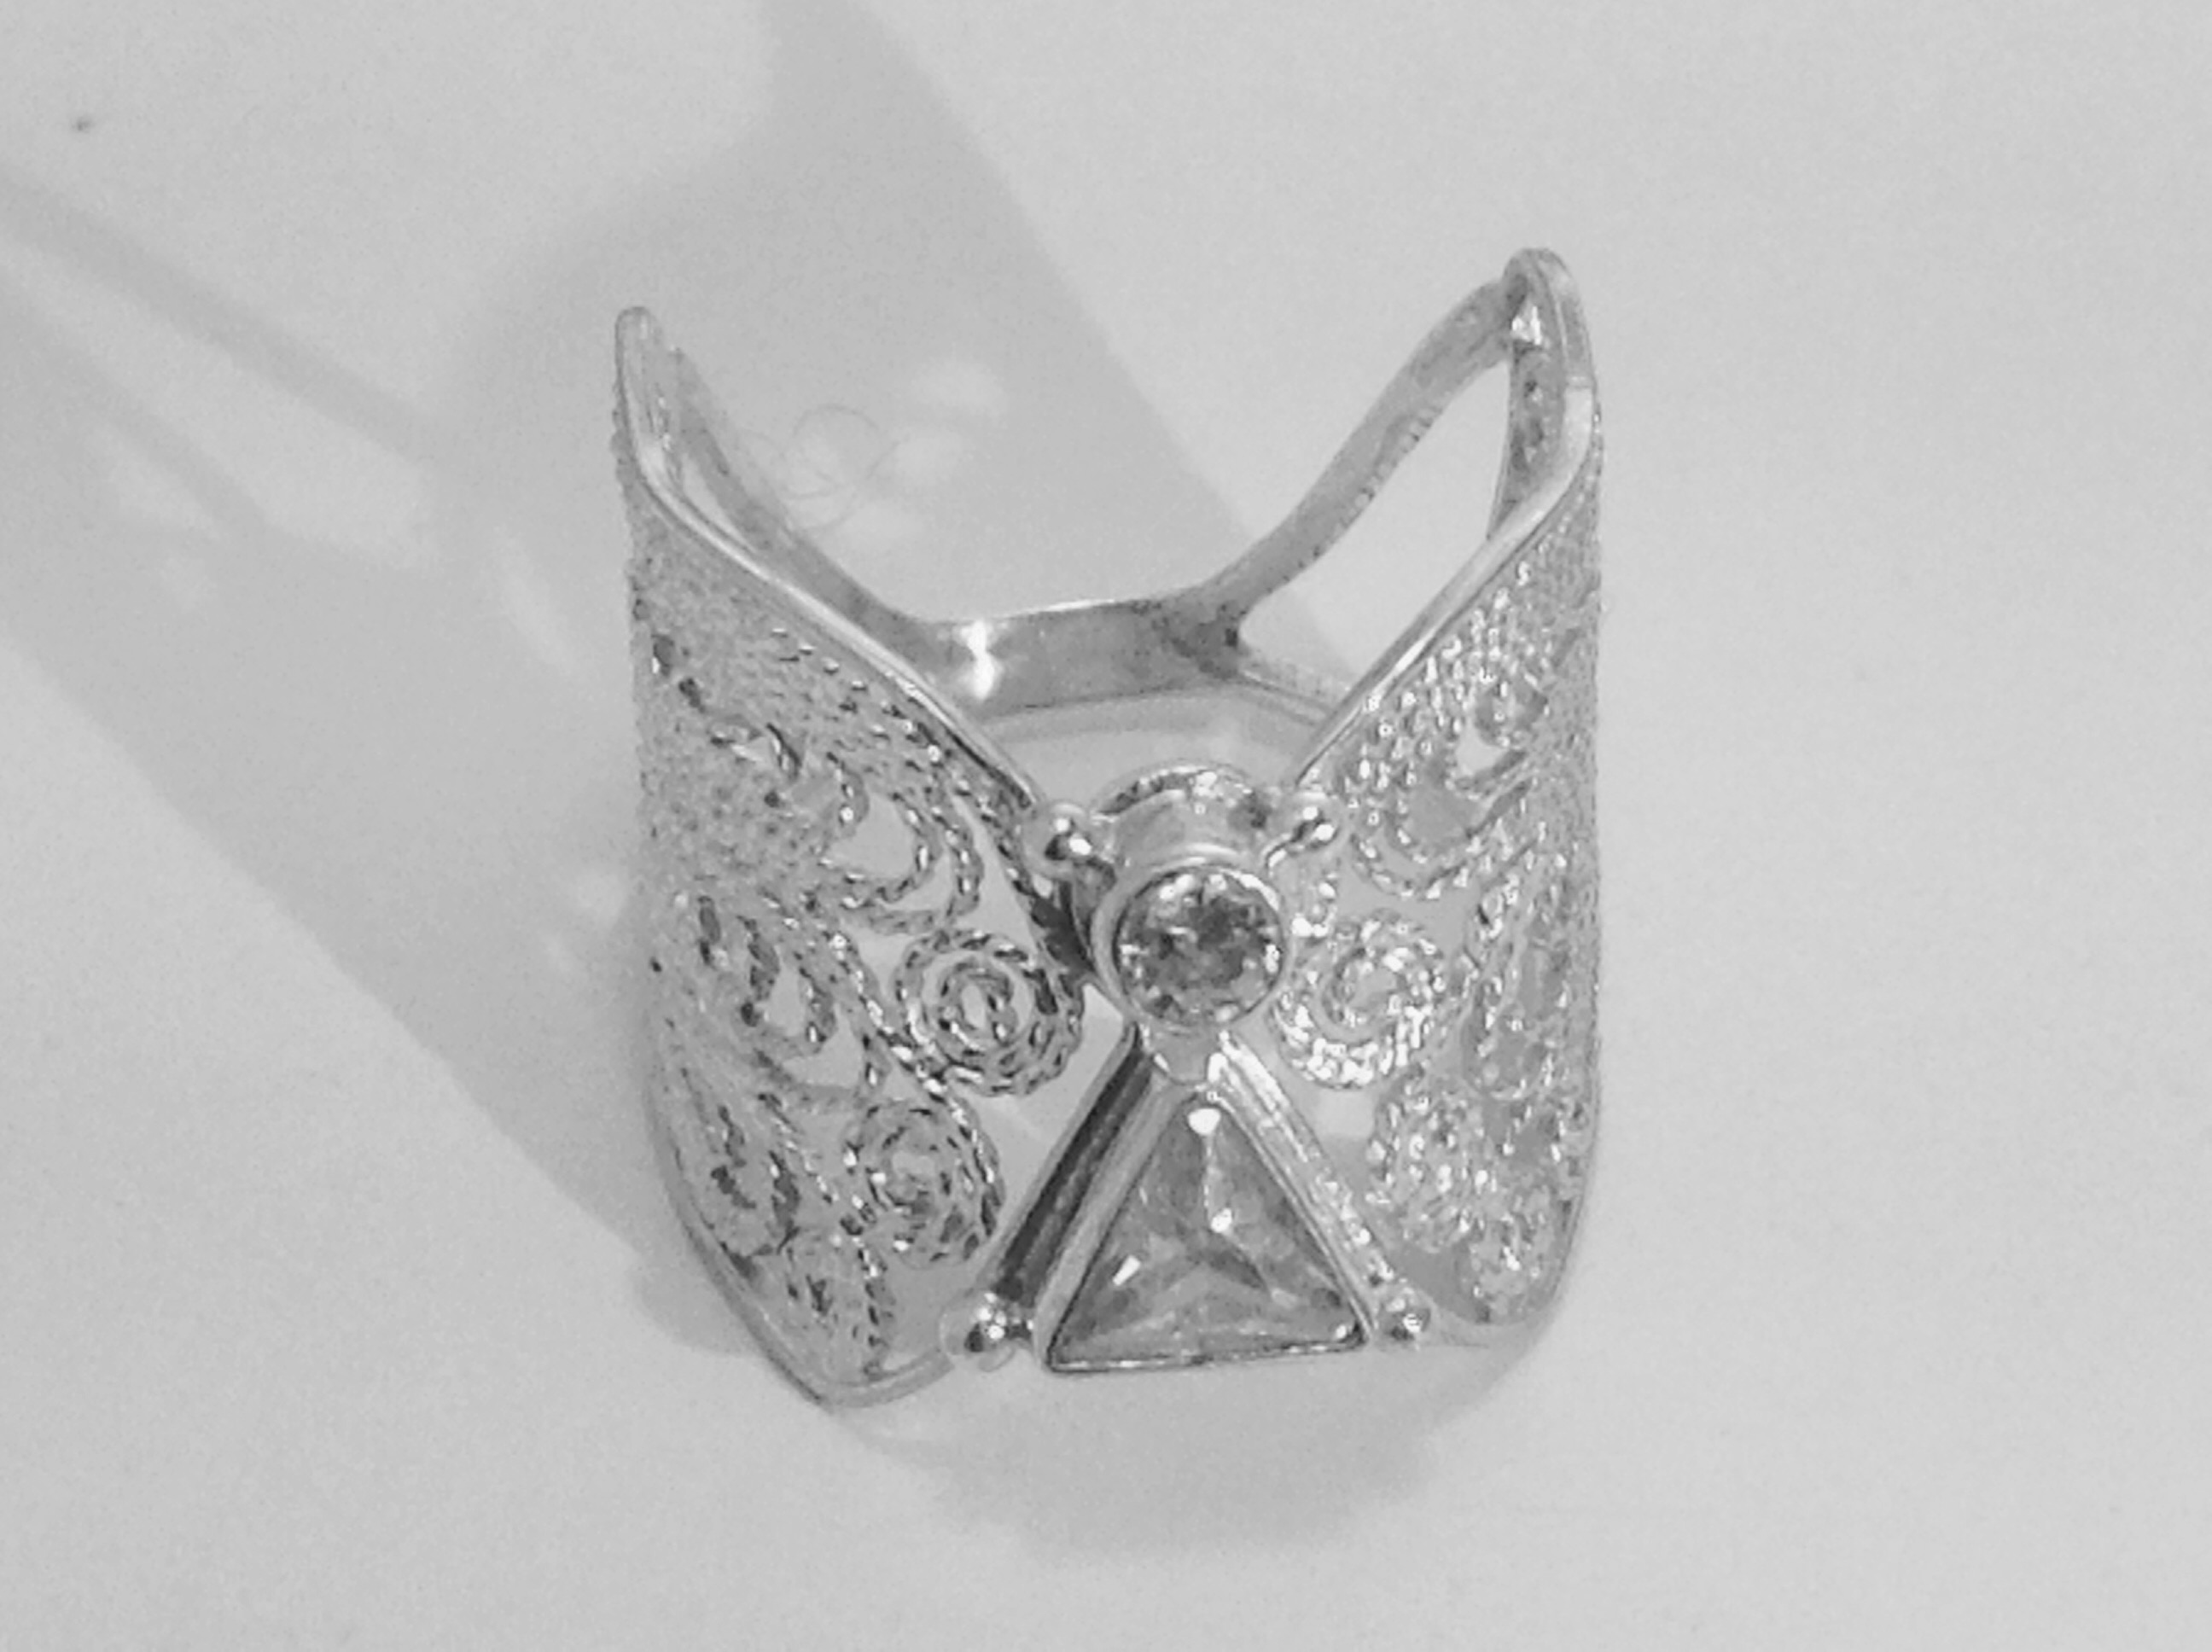 angel jewelry angel ring in silver filigree